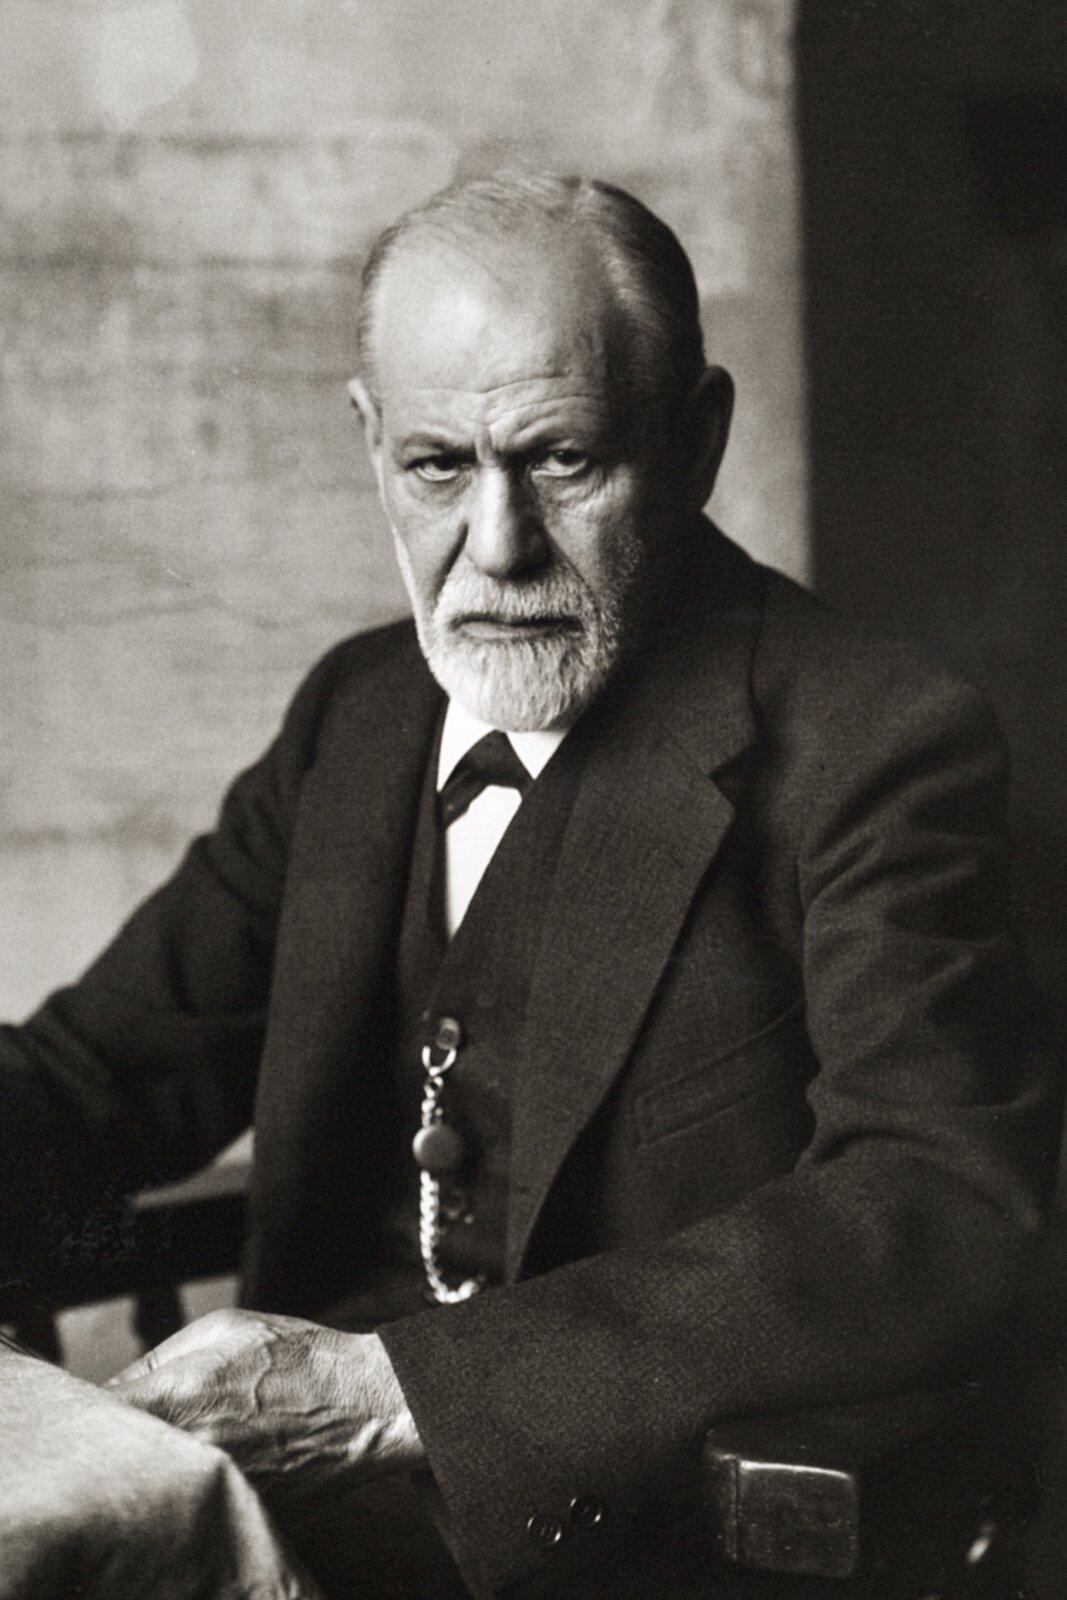 Sigmund Freud Źródło: Ferdinand Schmutzer, Sigmund Freud, 1926, domena publiczna.